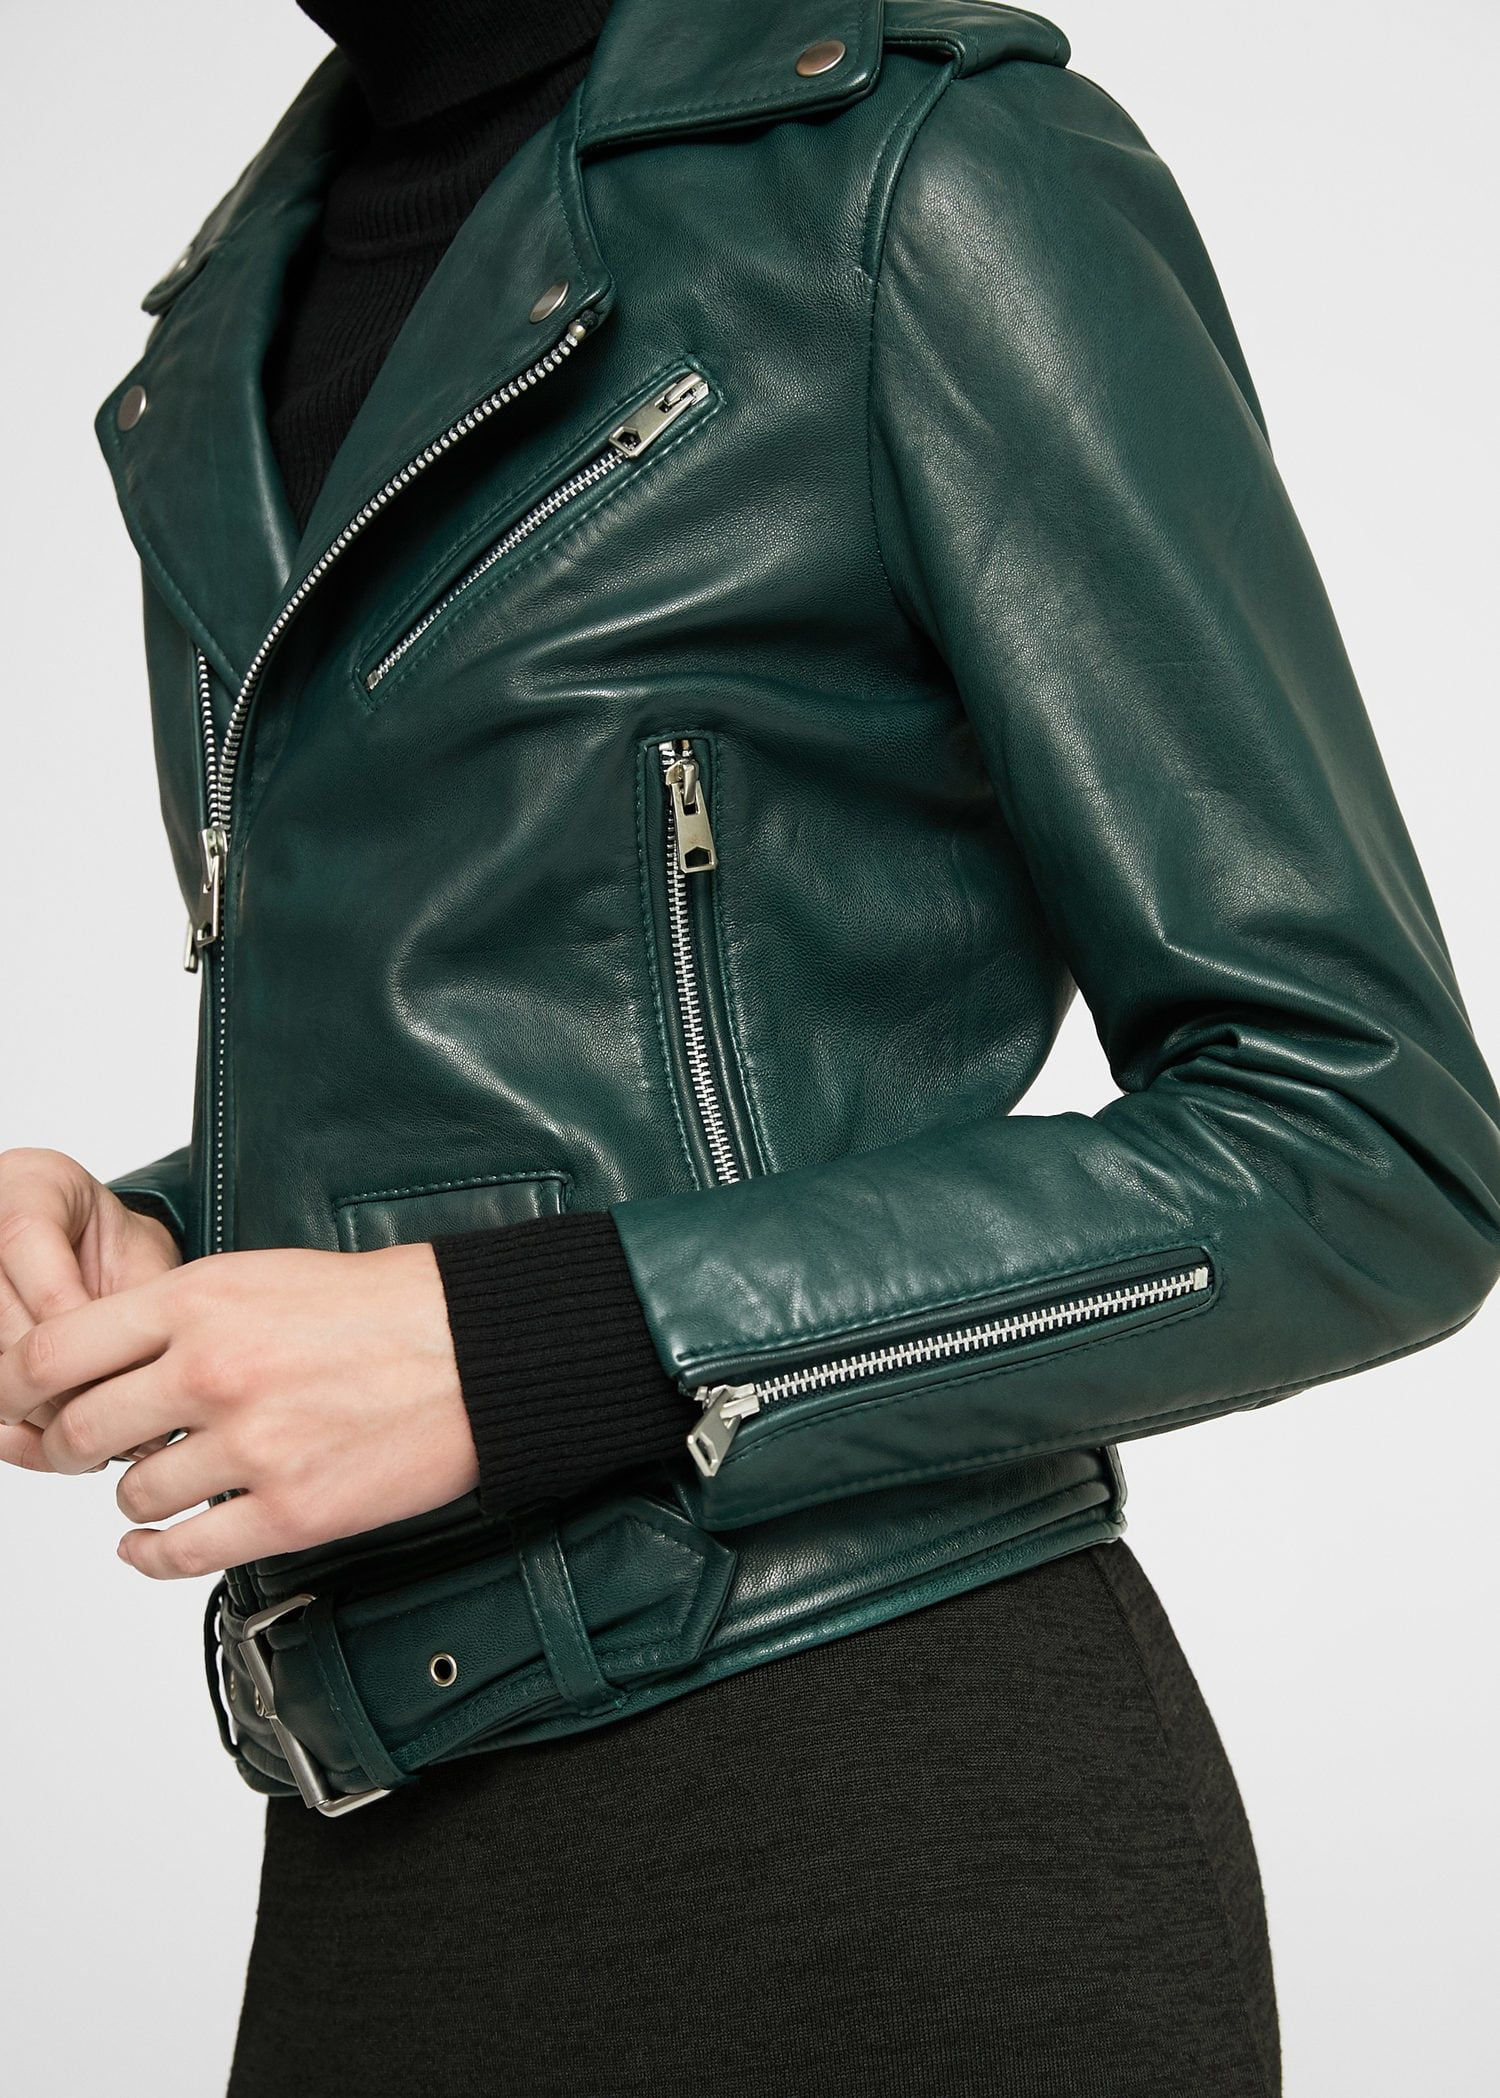 Leather Biker Jacket Women Mango Usa Green Leather Jacket Outfit Leather Jackets Women Leather Jacket Outfits [ 2098 x 1500 Pixel ]